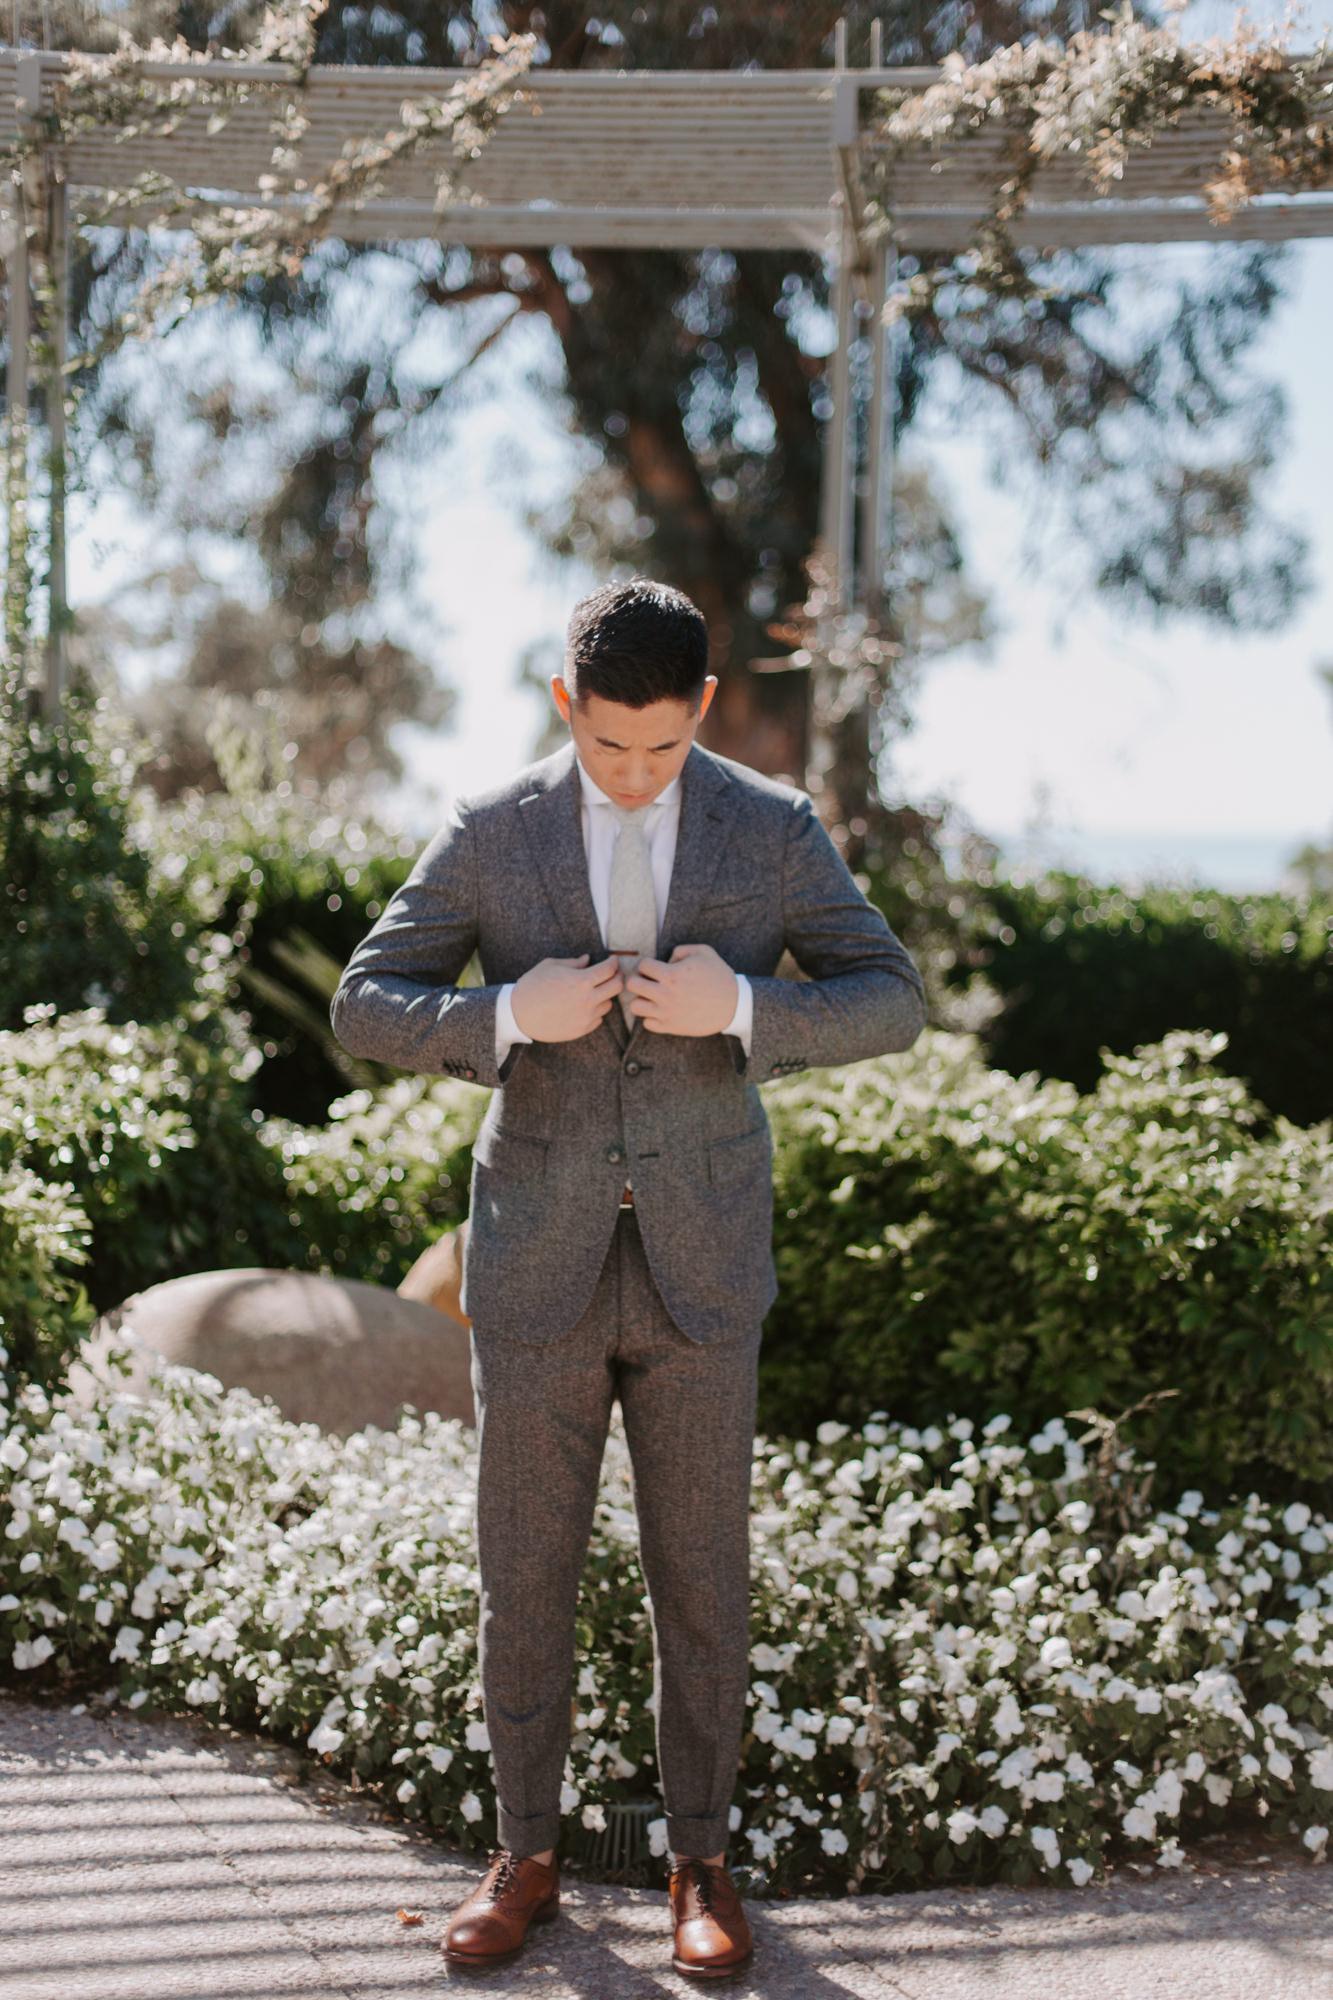 San Diego Wedding photography at Martin Johnson House Scripps Beach020.jpg